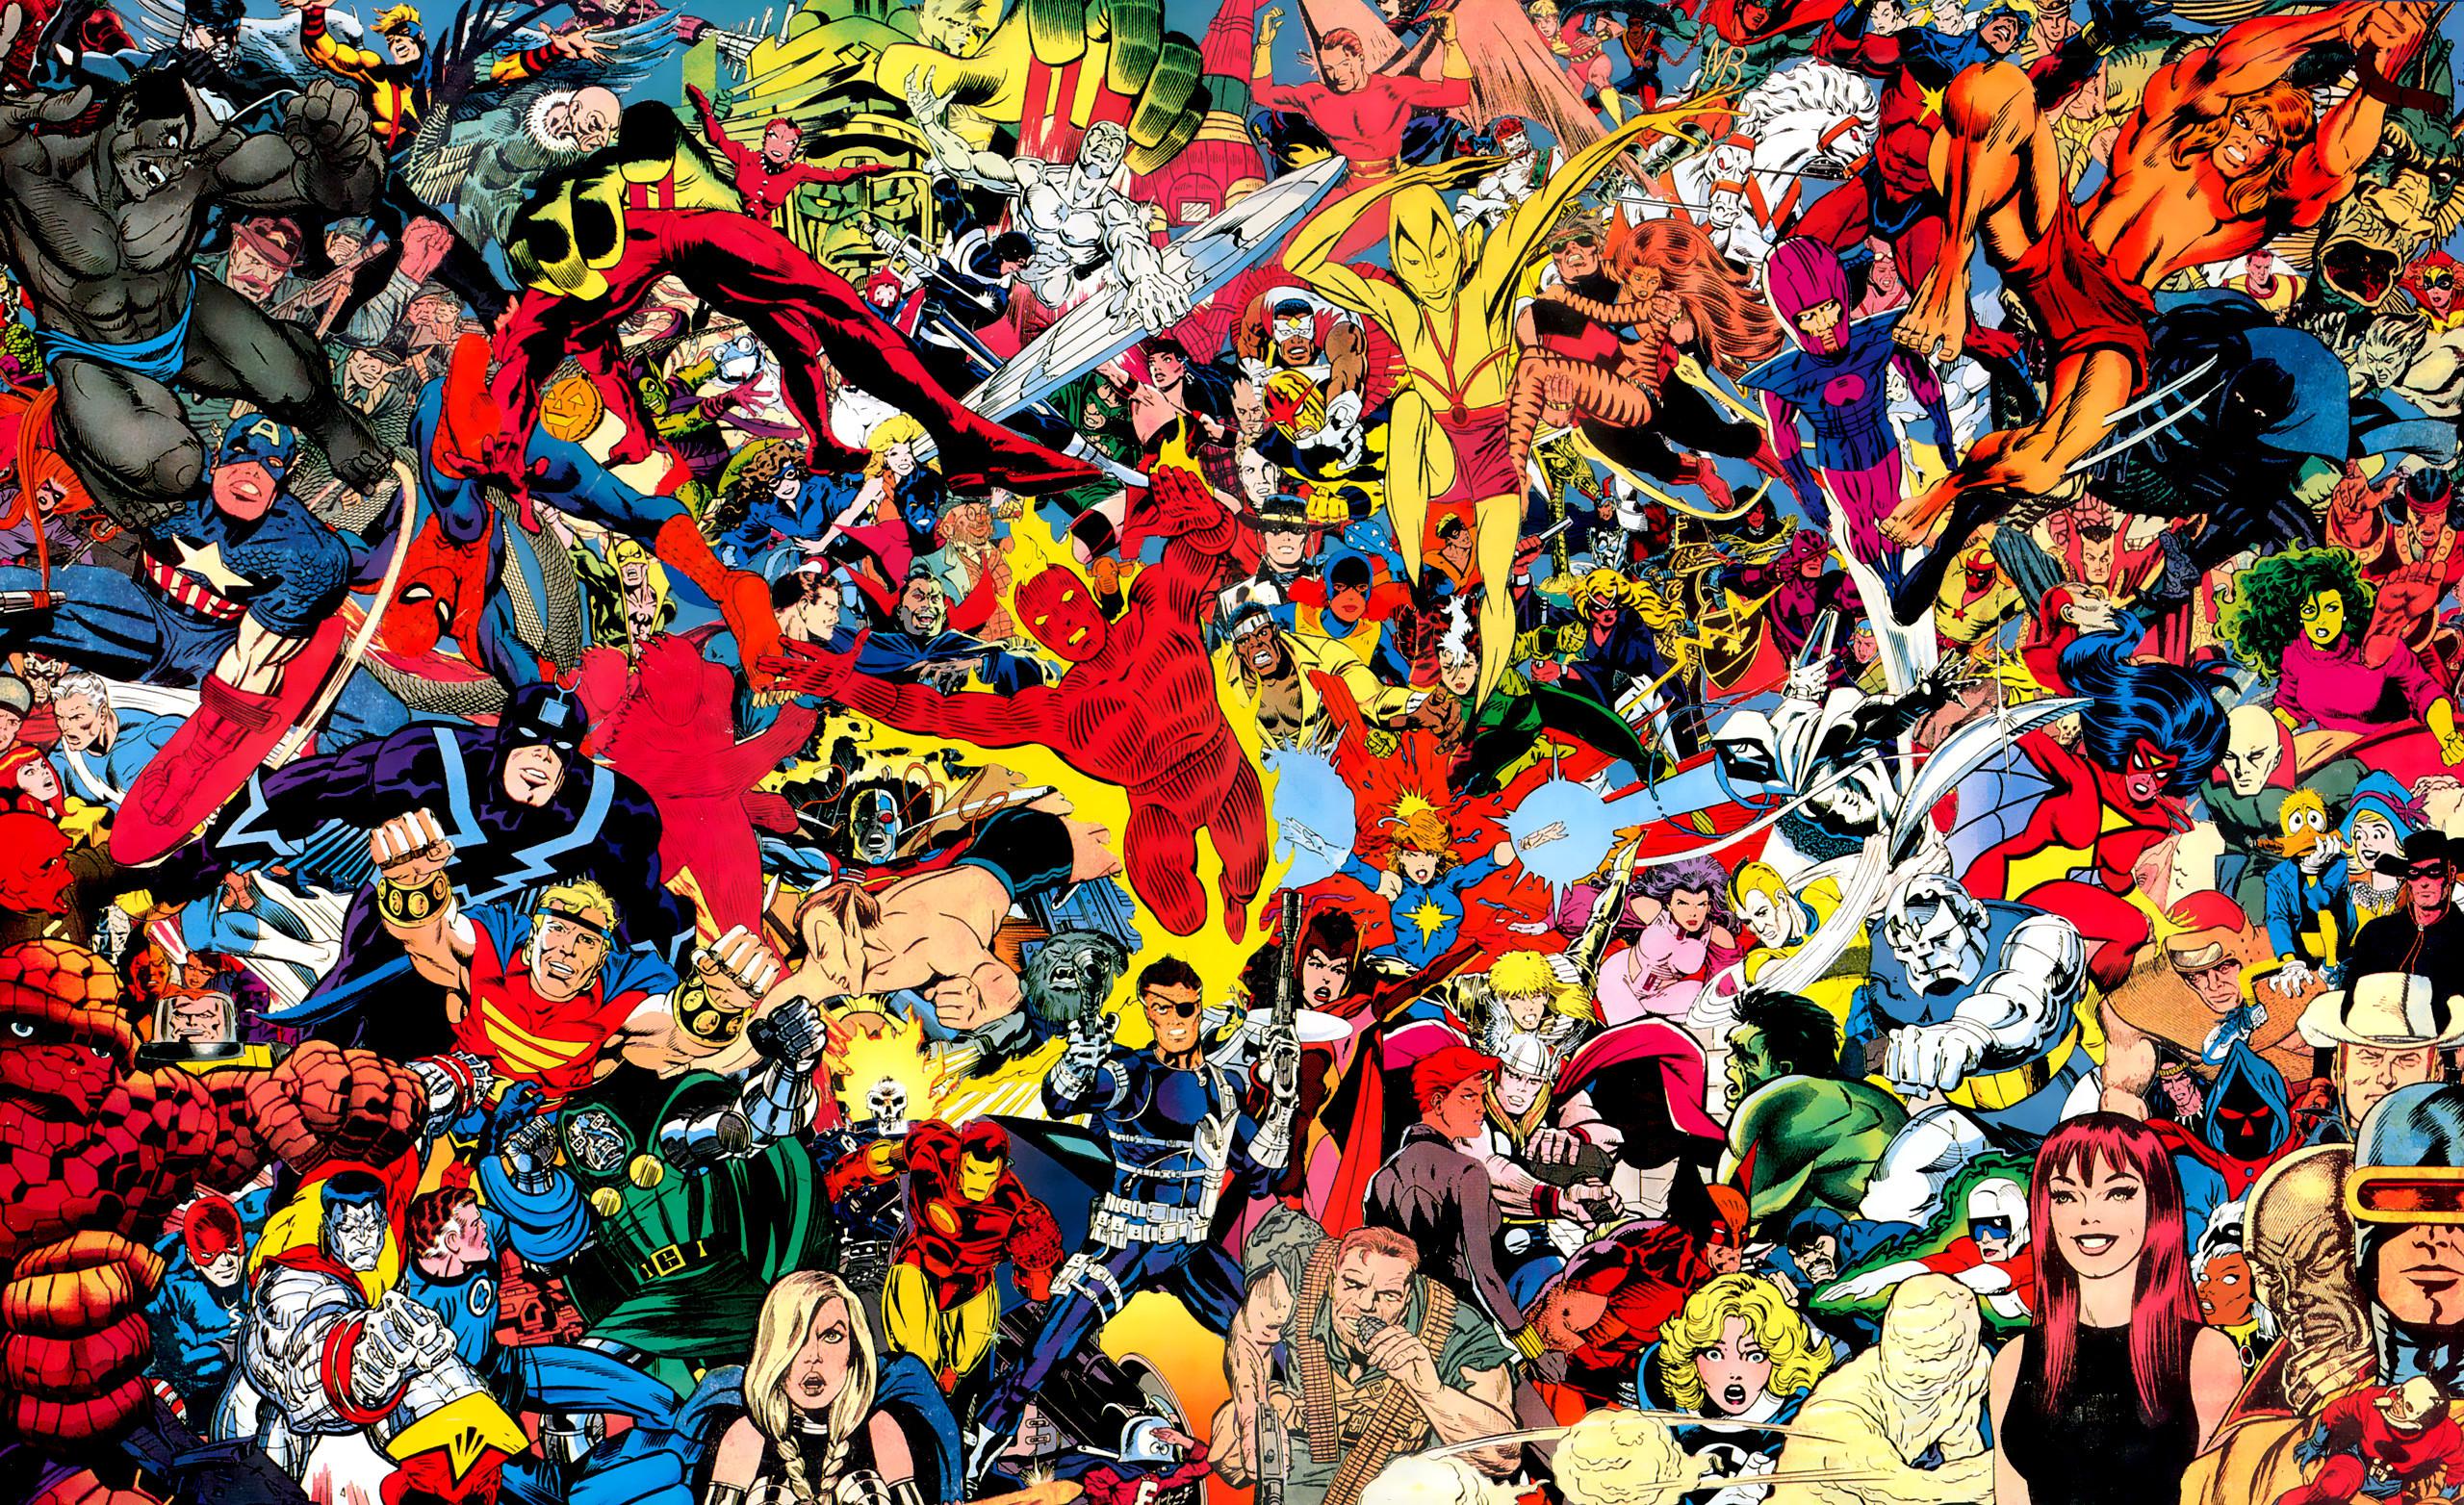 Marvel super heroes wallpaper 71 images - All marvel heroes wallpaper ...